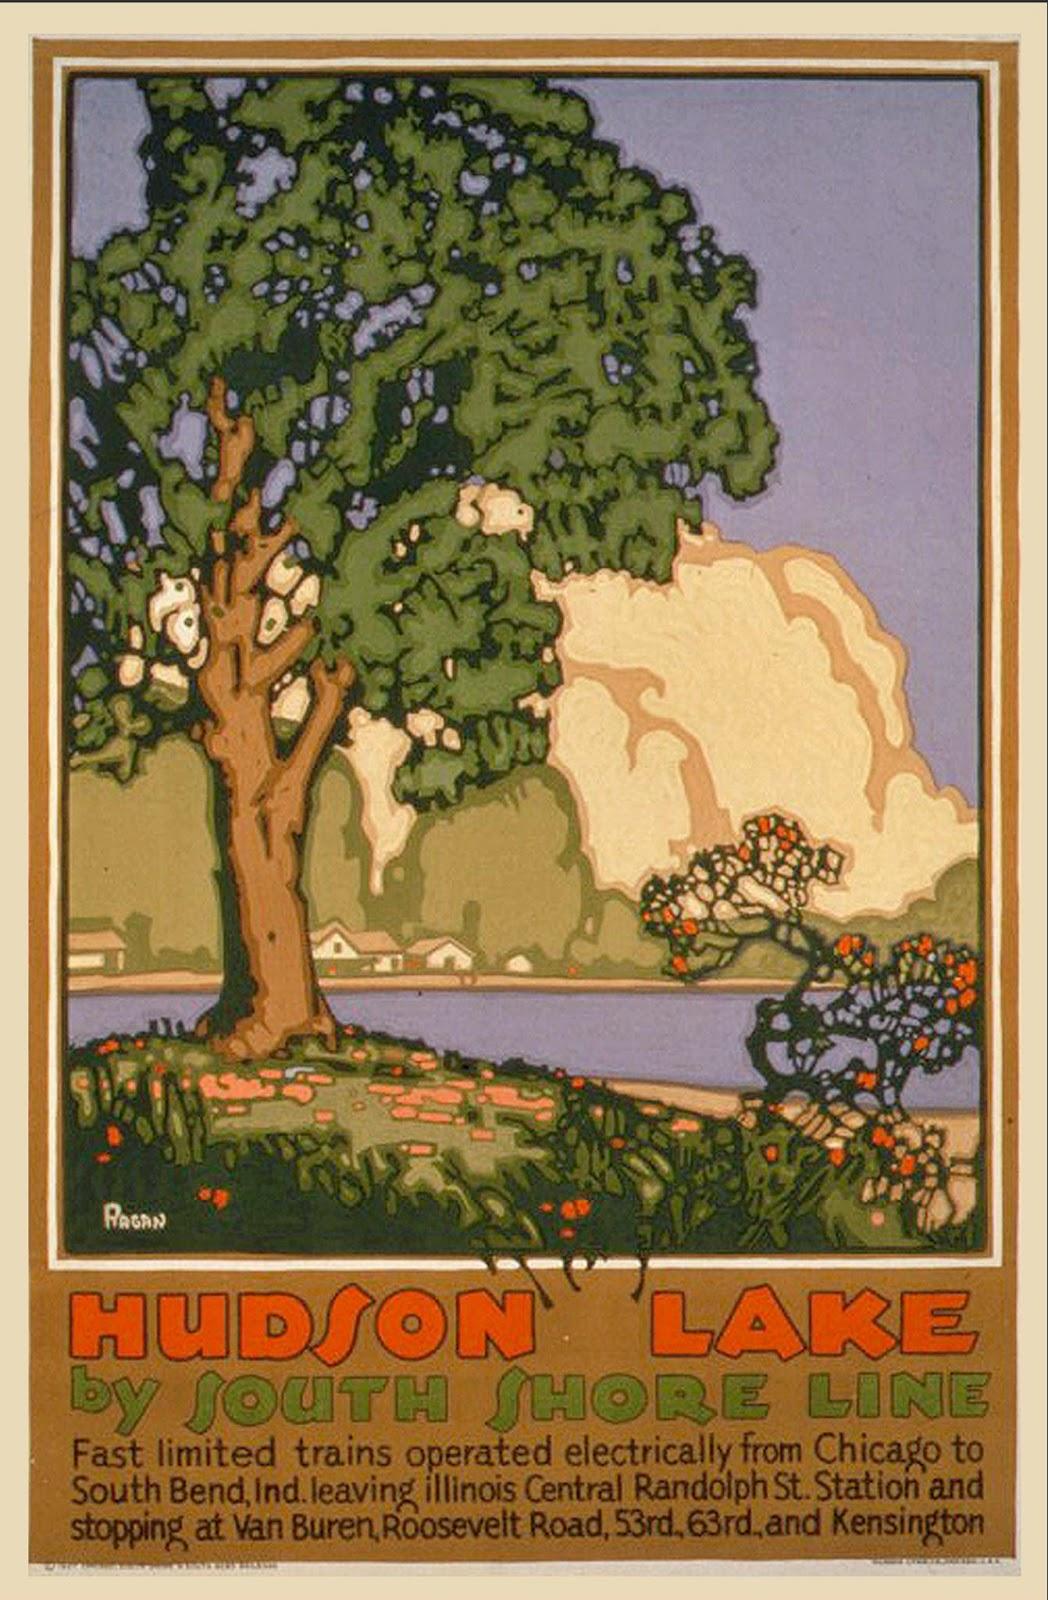 Niagra Falls Vintage Railroad Travel Poster 11x17 inch Travel by Train